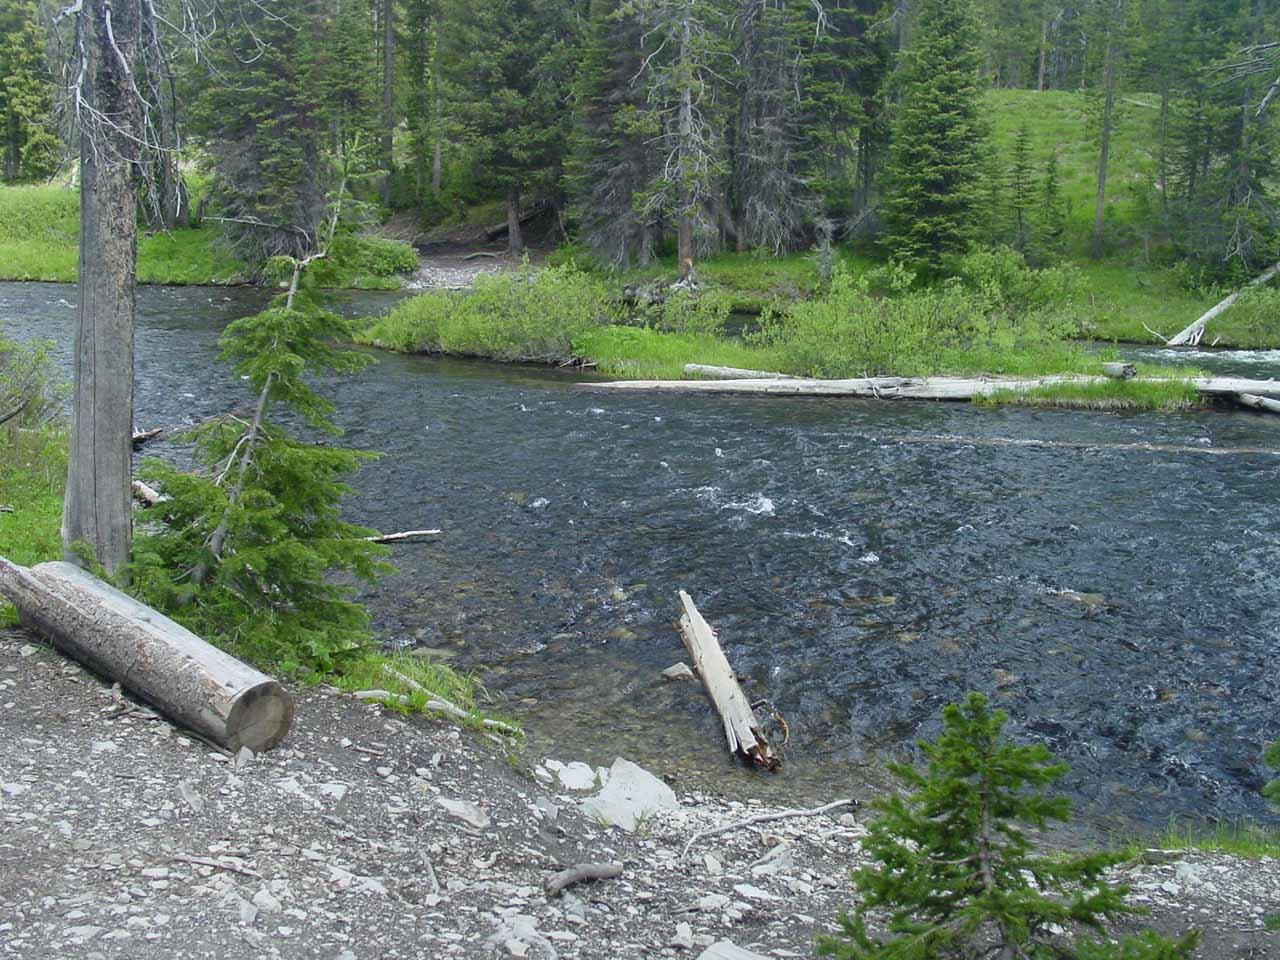 Falls River Crossing en route to Union Falls